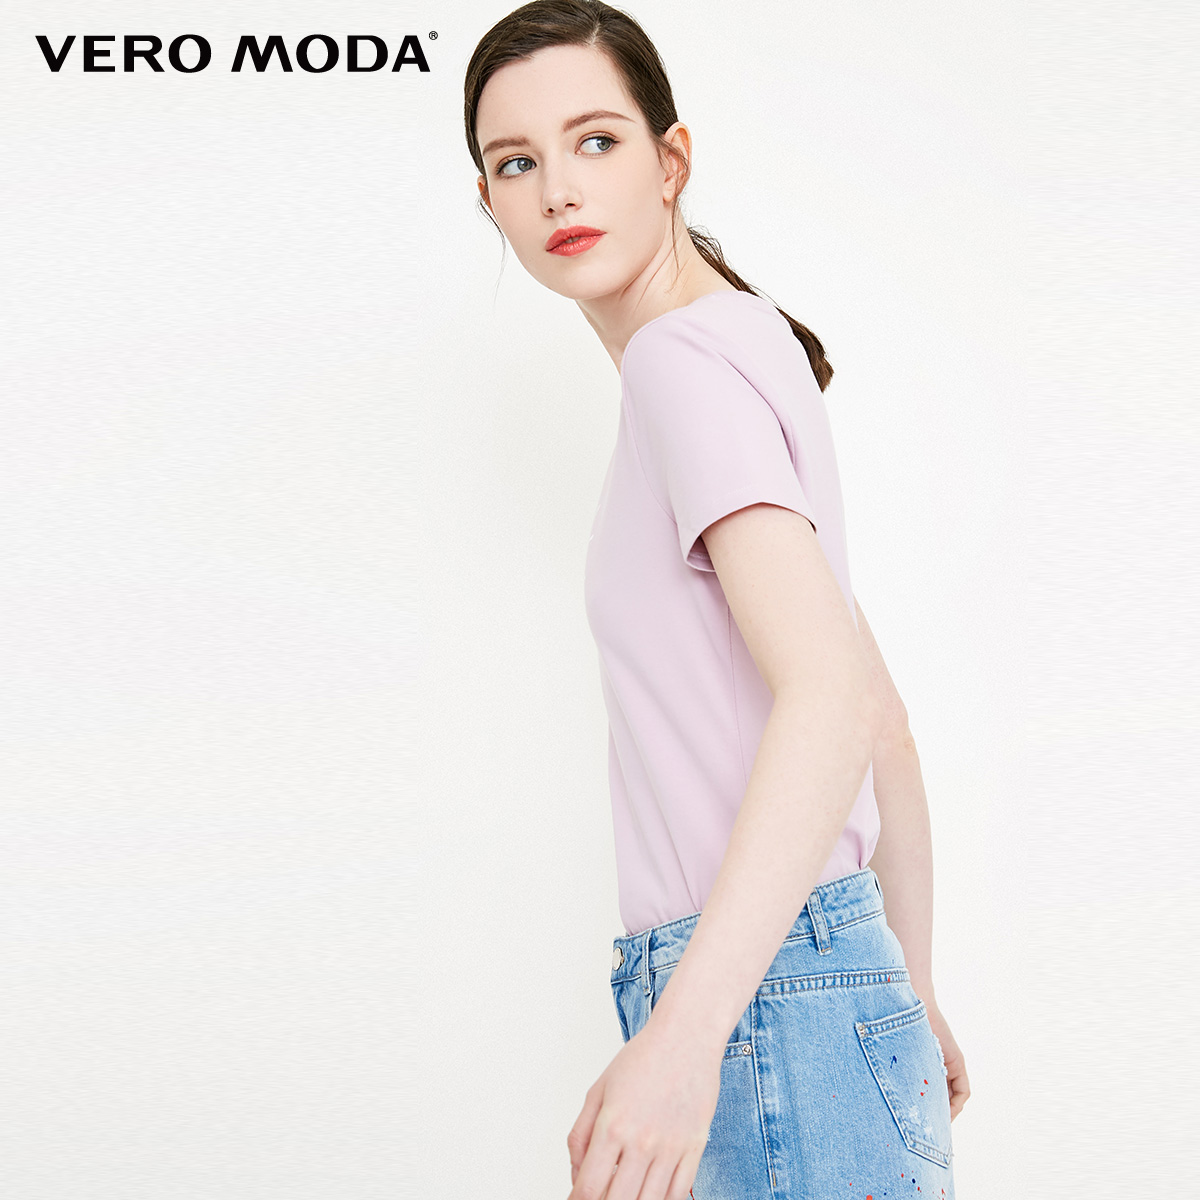 Vero Moda 2019 new letter pattern print slim stretch short-sleeved T-shirt |318301501